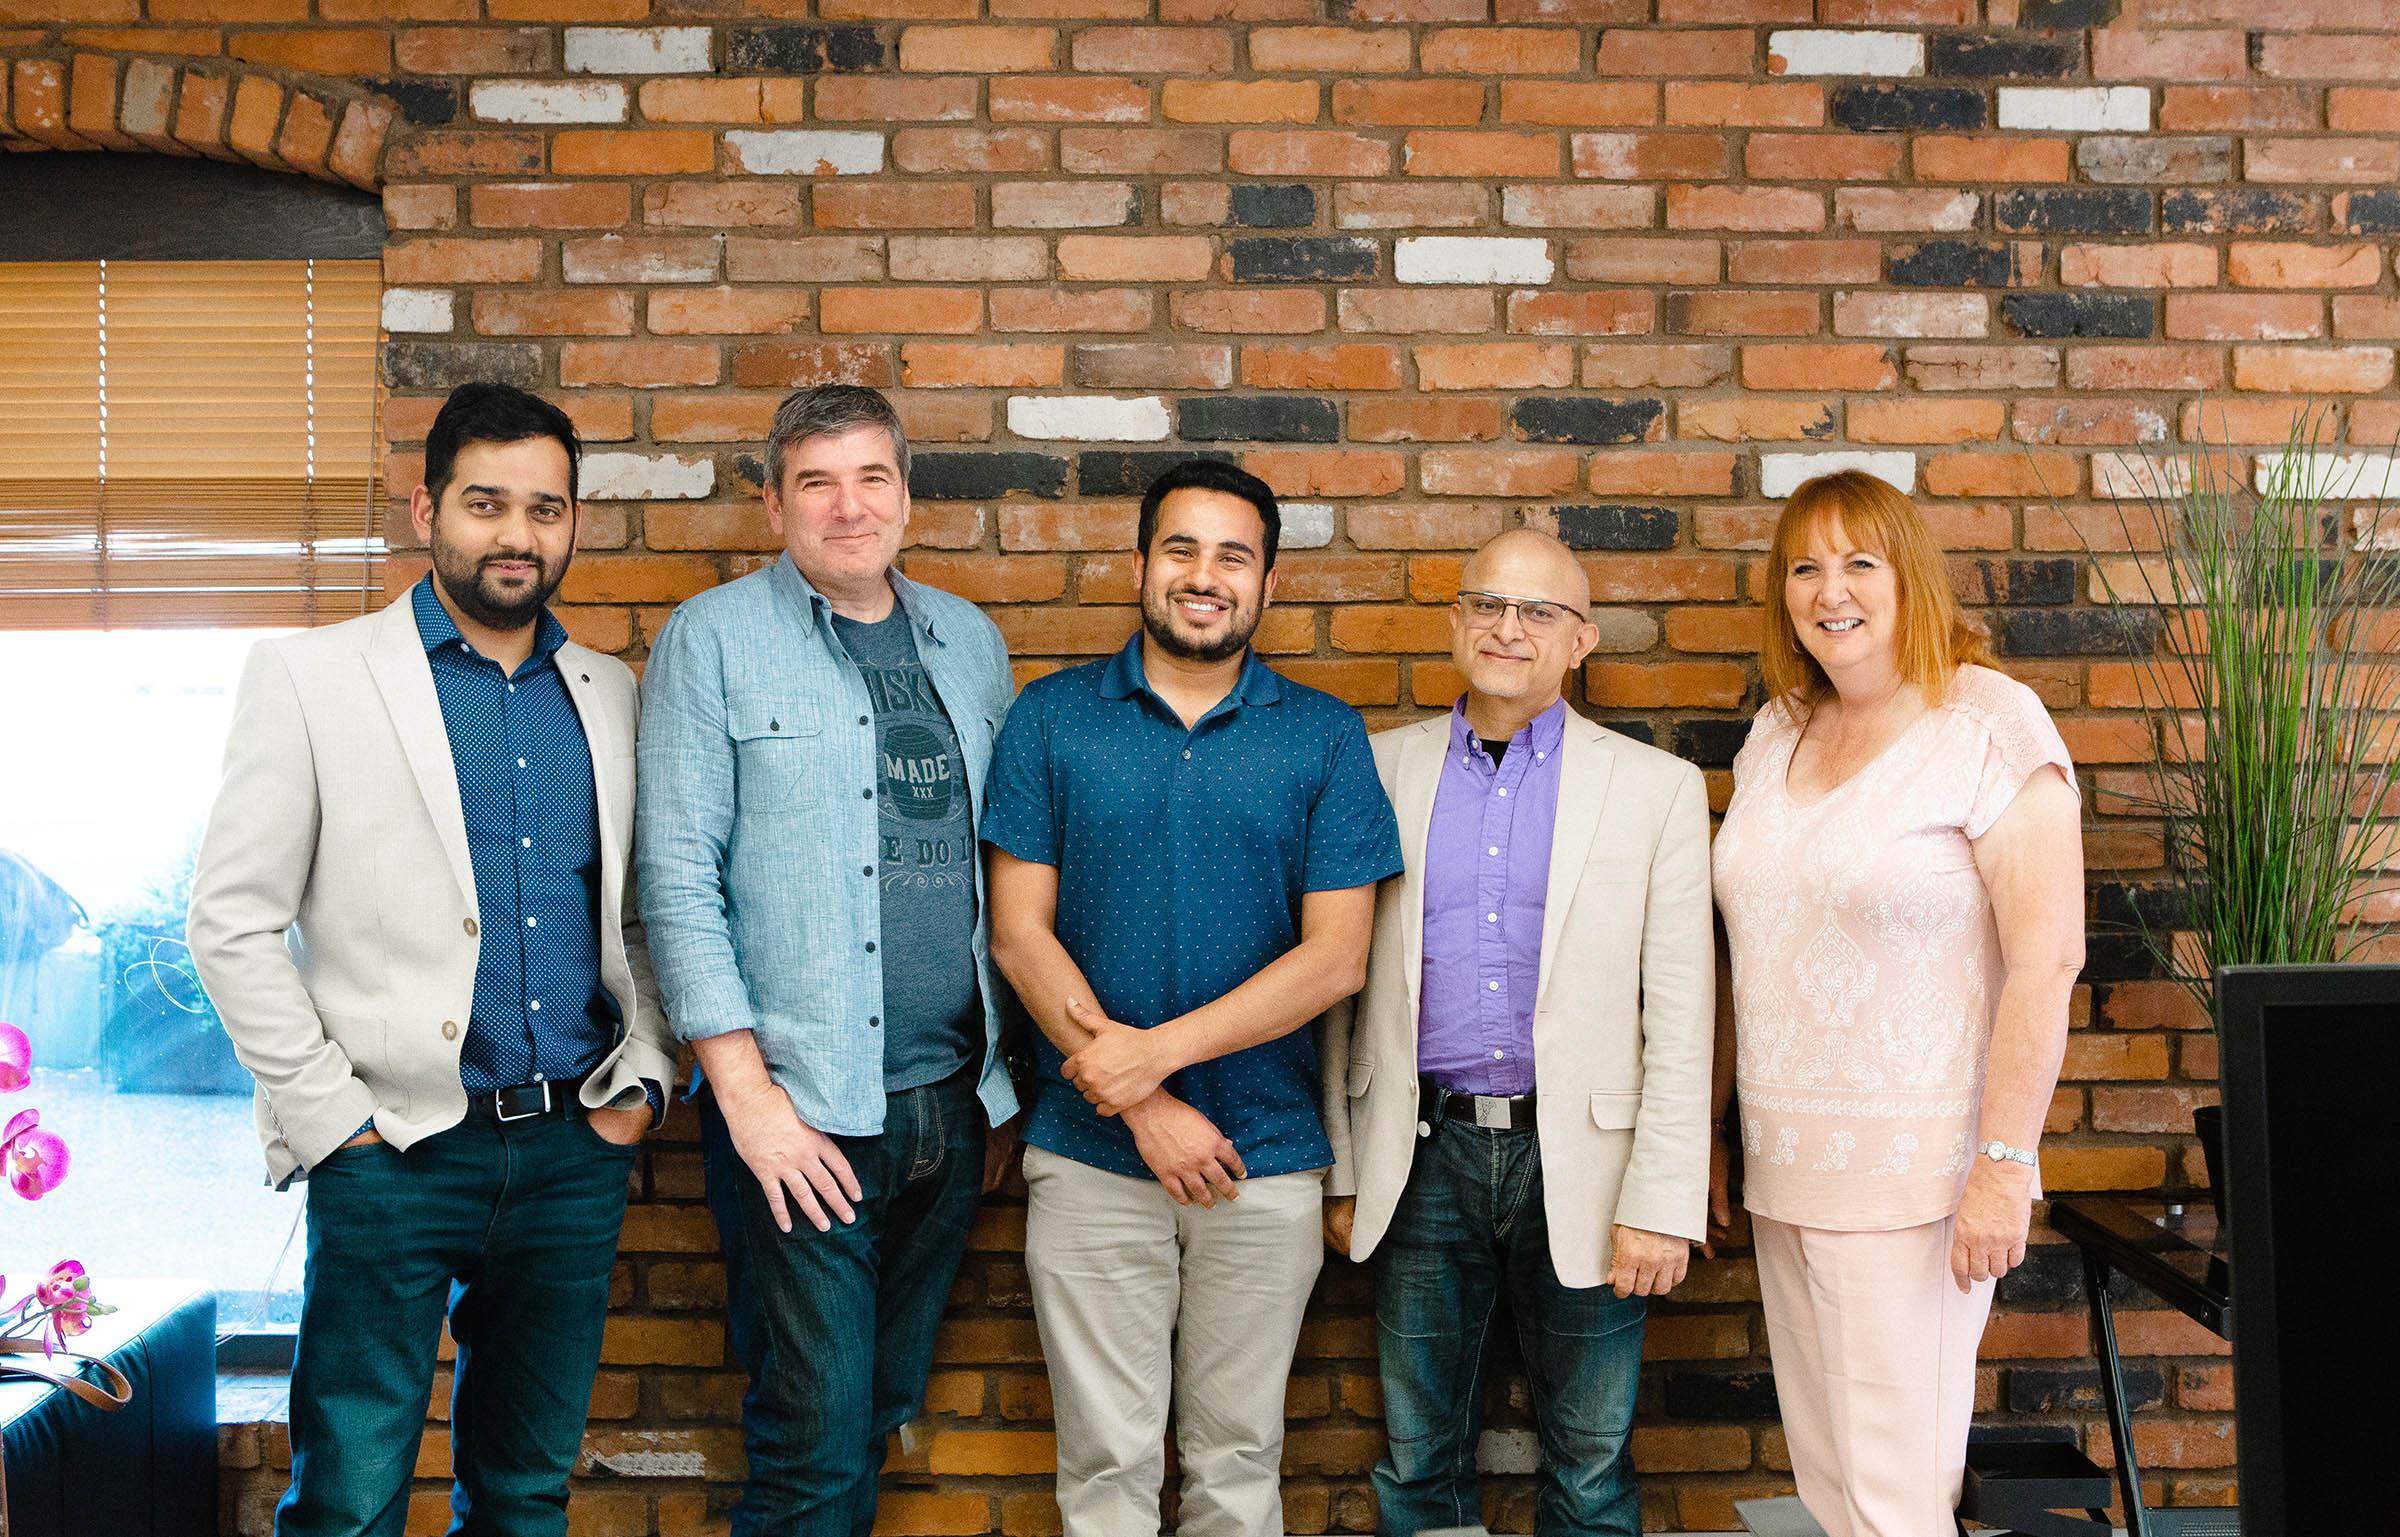 From left to right: Sam Mod (FreshWorks CEO), Stuart Silberg (APFM CTO), Rohit Boulchandani (FreshWorks COO), Nitin Chandra (APFM Director of Apps), Bernie Zigler (APFM Director of Quality Assurance)